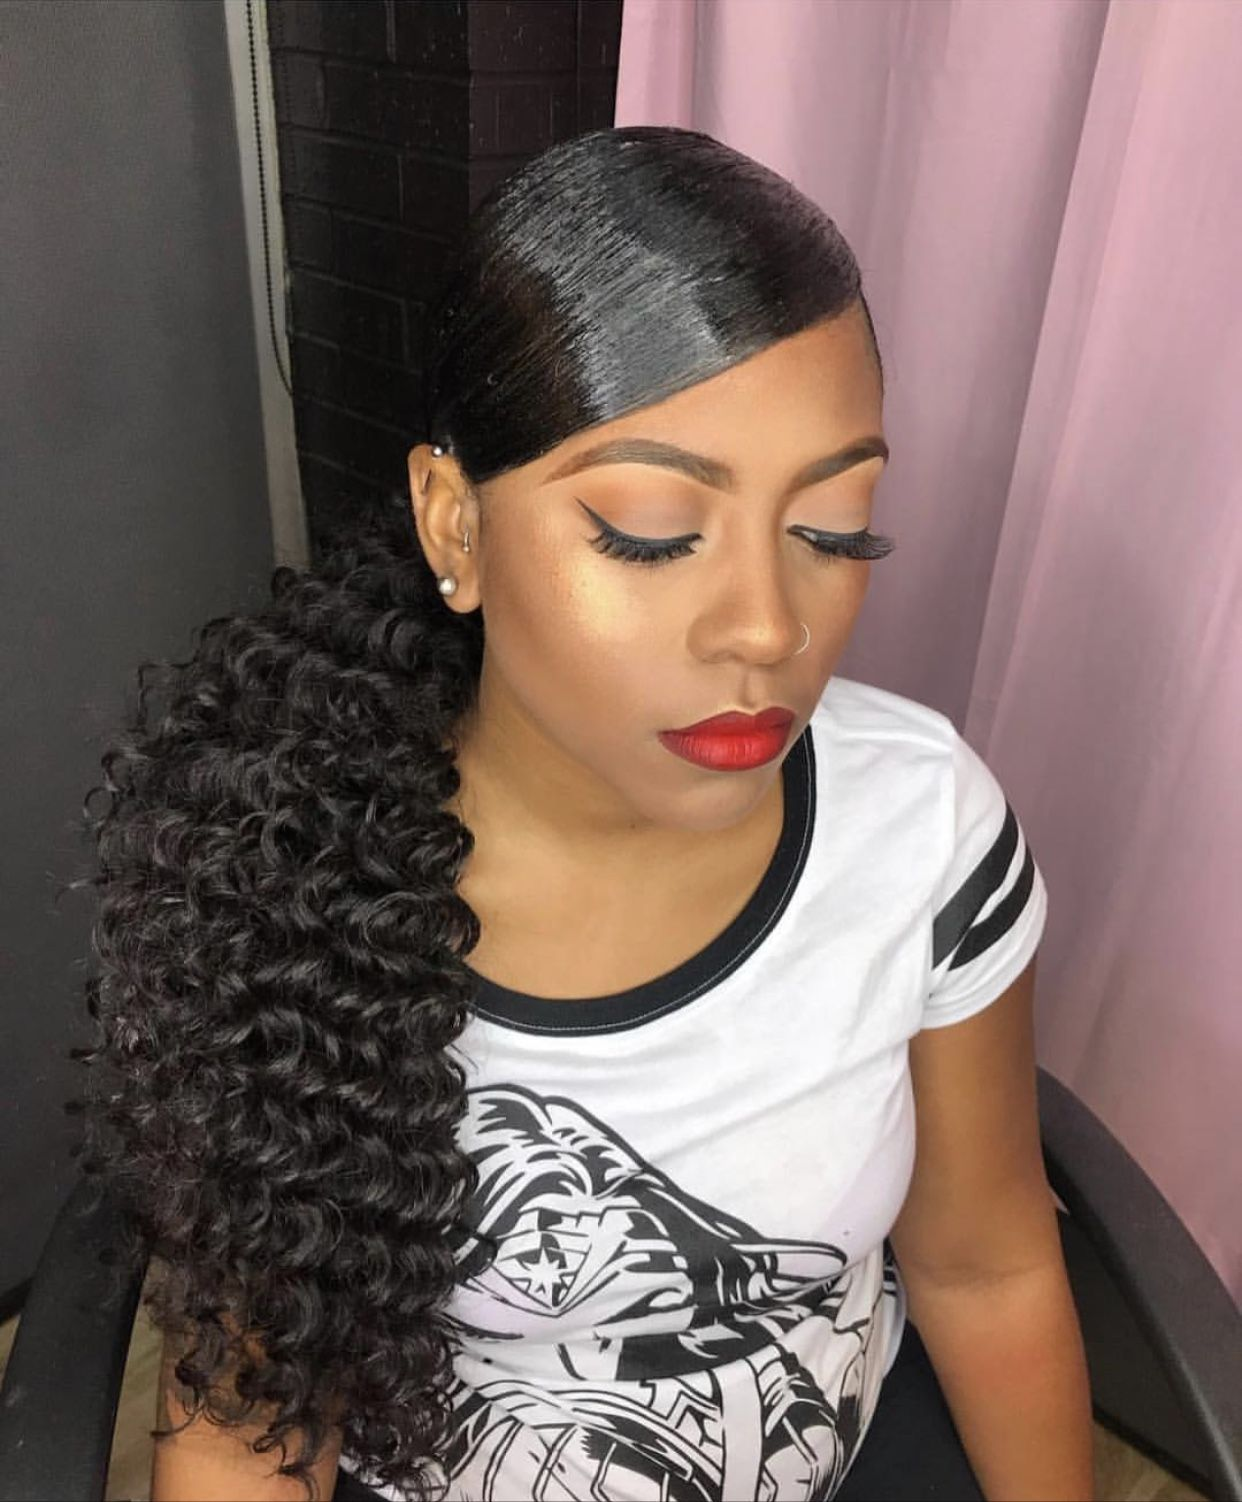 hairstyle ideas sleek ponytail